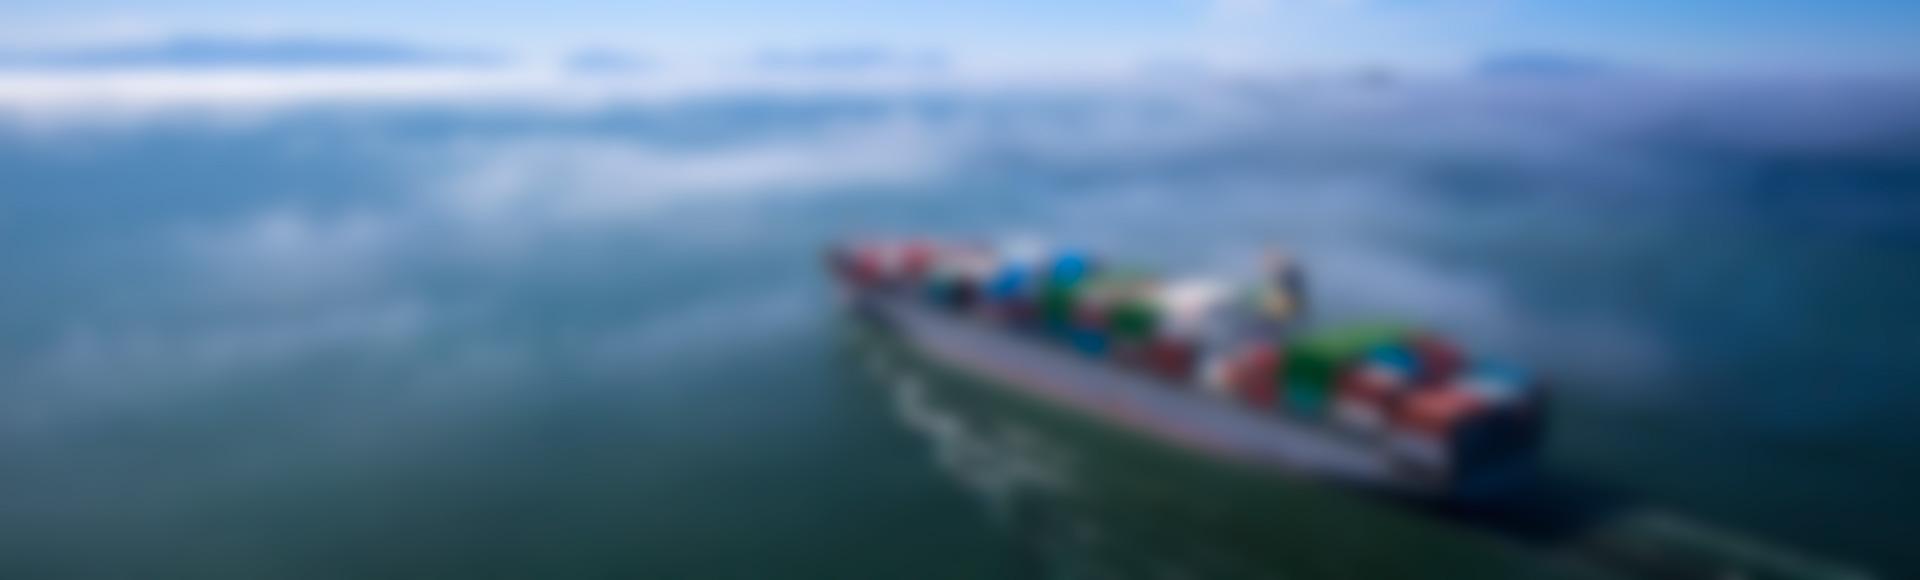 maritime-blured